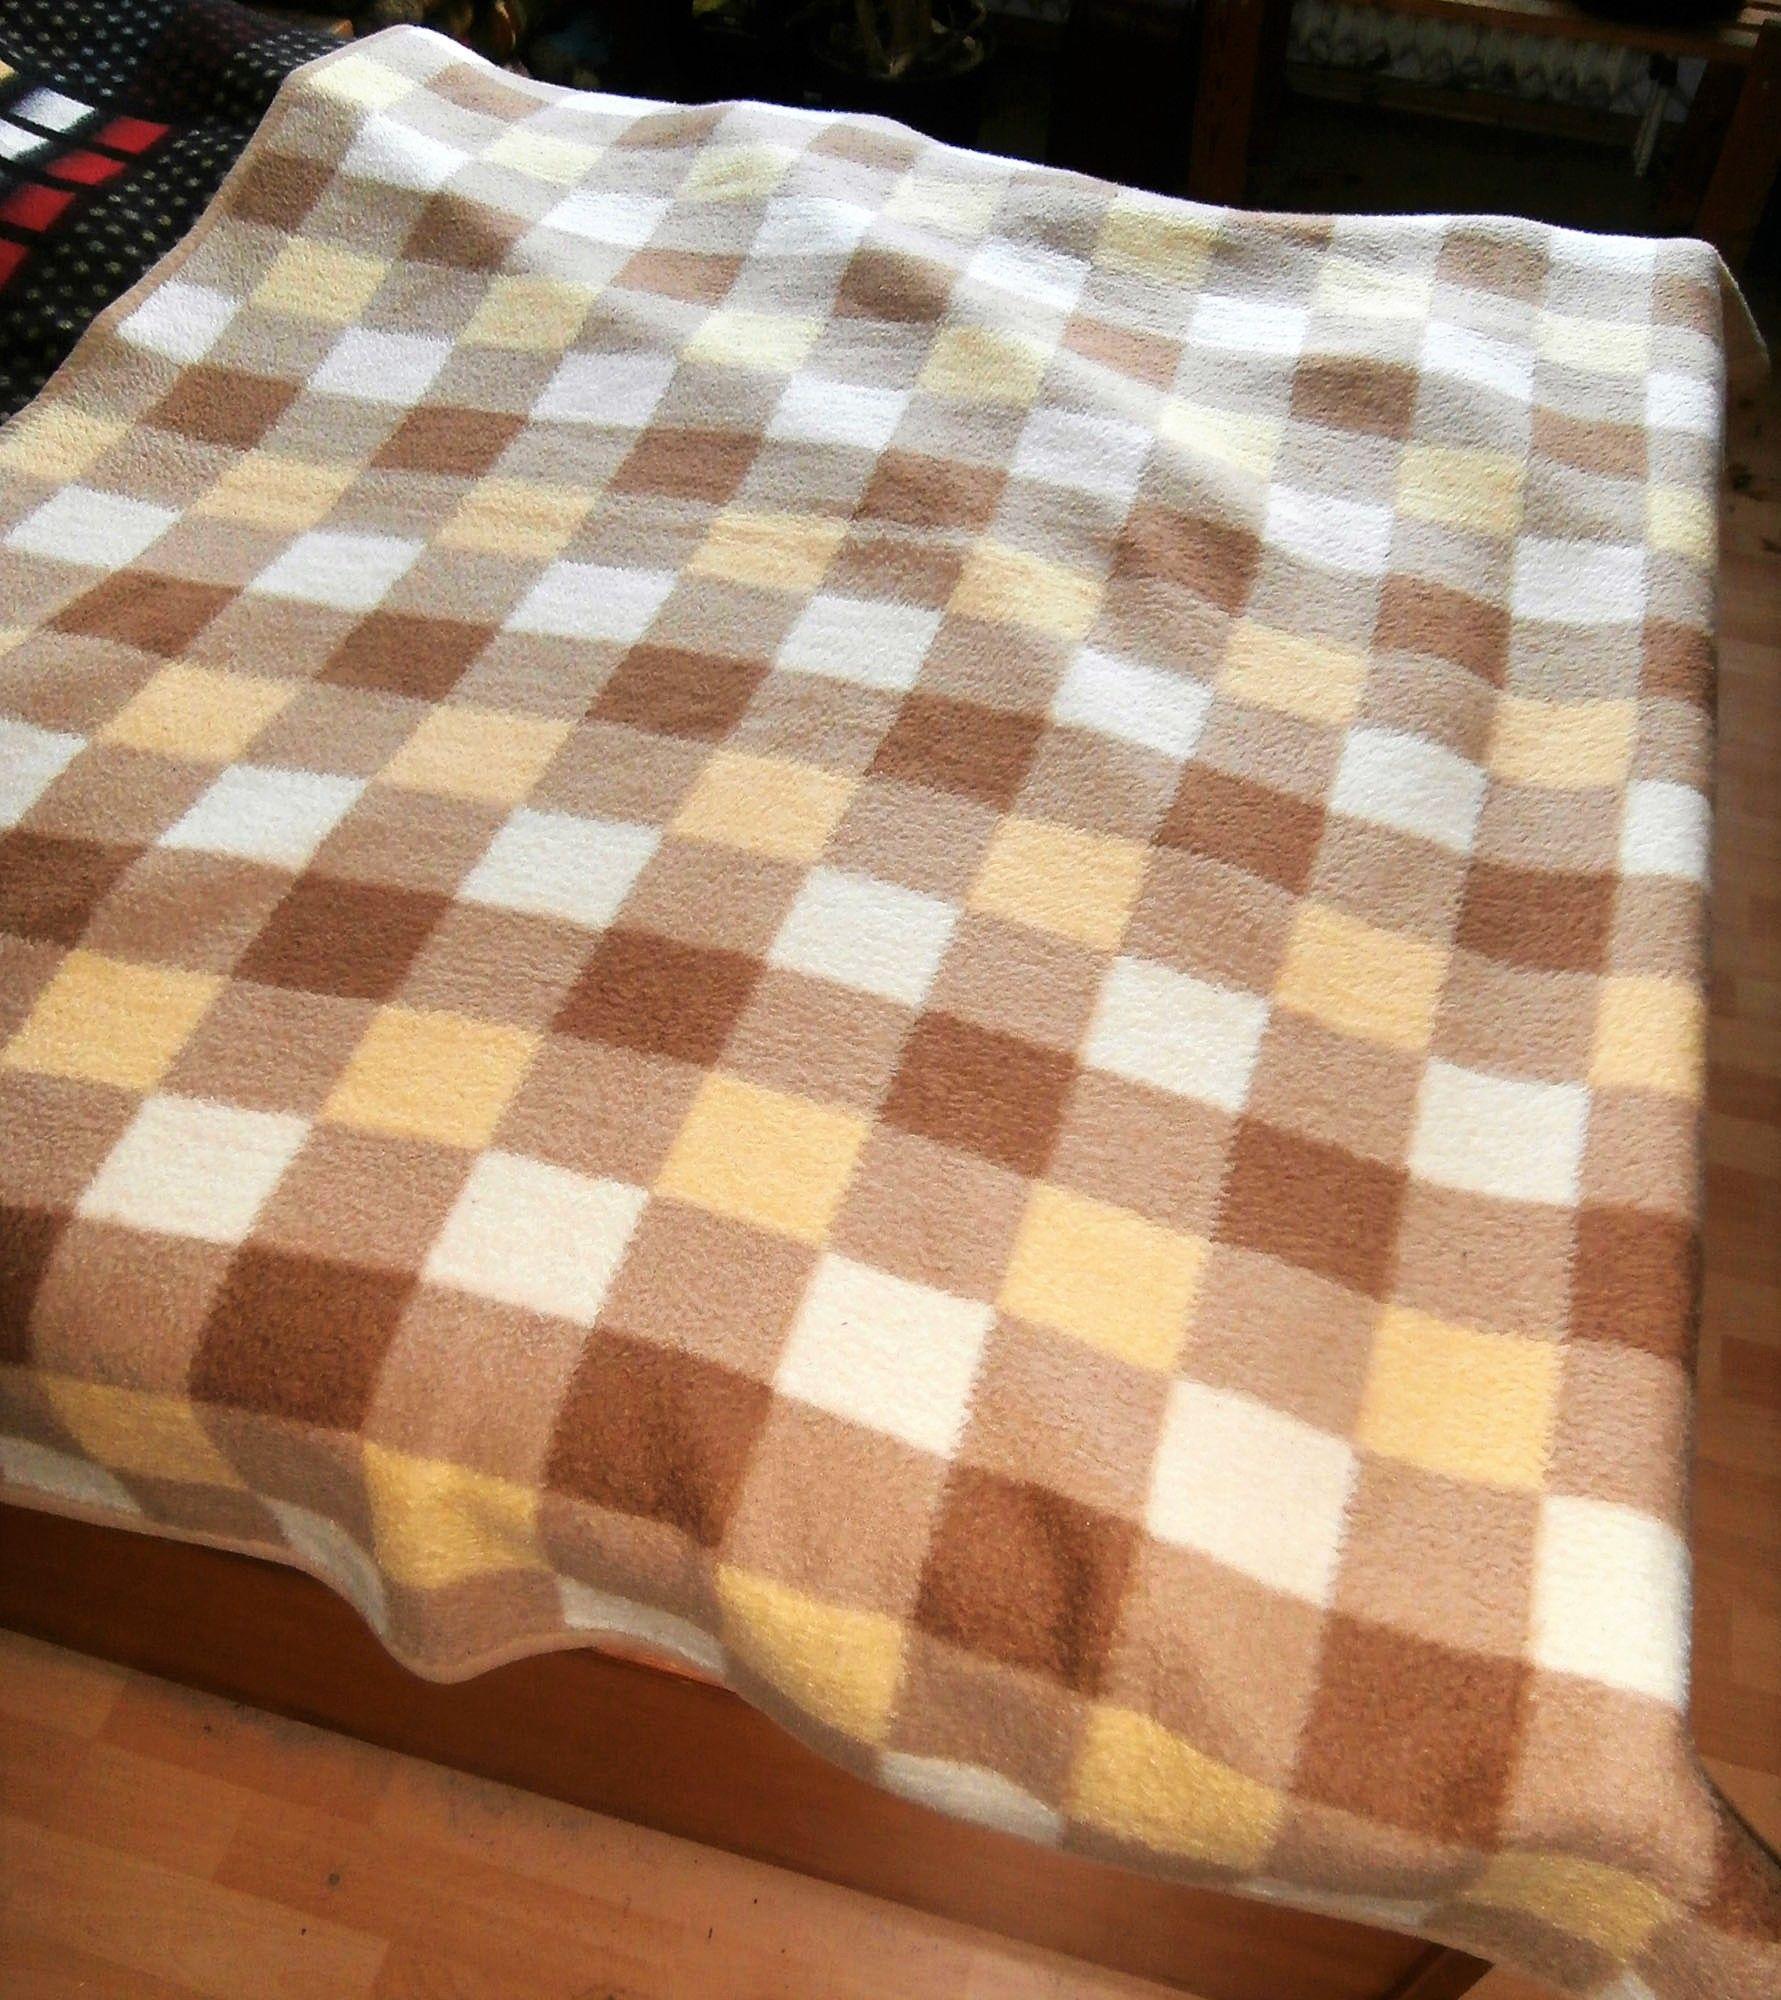 Vintage Woolblanket Retroblankets Blanketmuseum 50s 60s Oudedekens Vintageblanket Vintagedeken Retrodeken Wollendeken B In 2020 Wolldecke Flauschig Decke